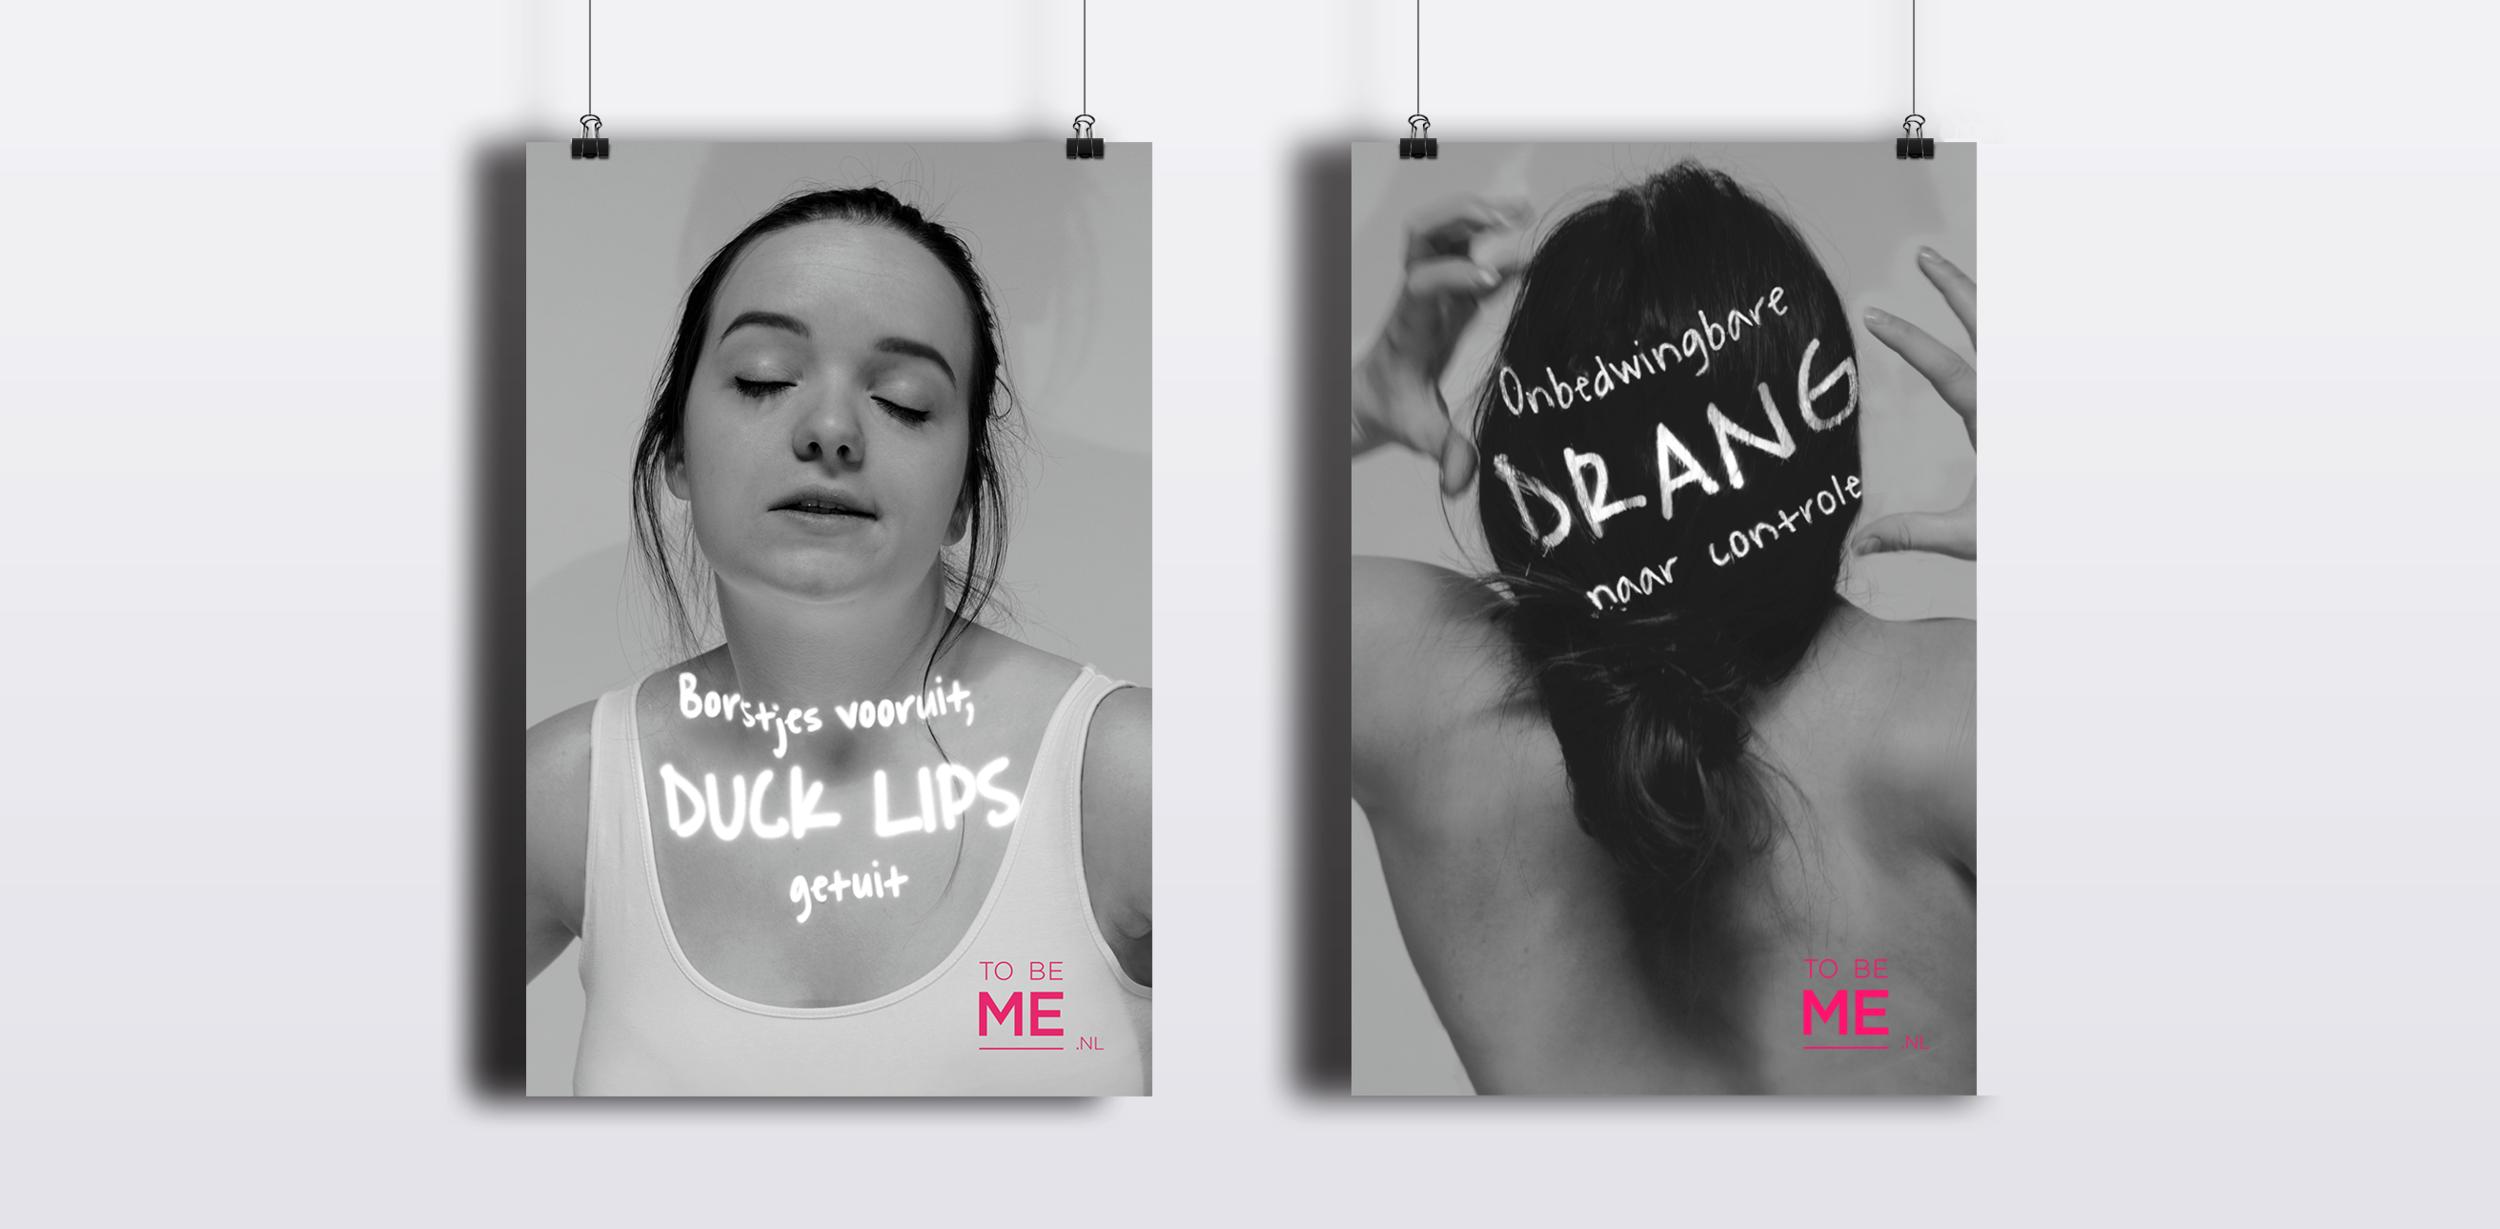 Tobeme affiche duckface.png